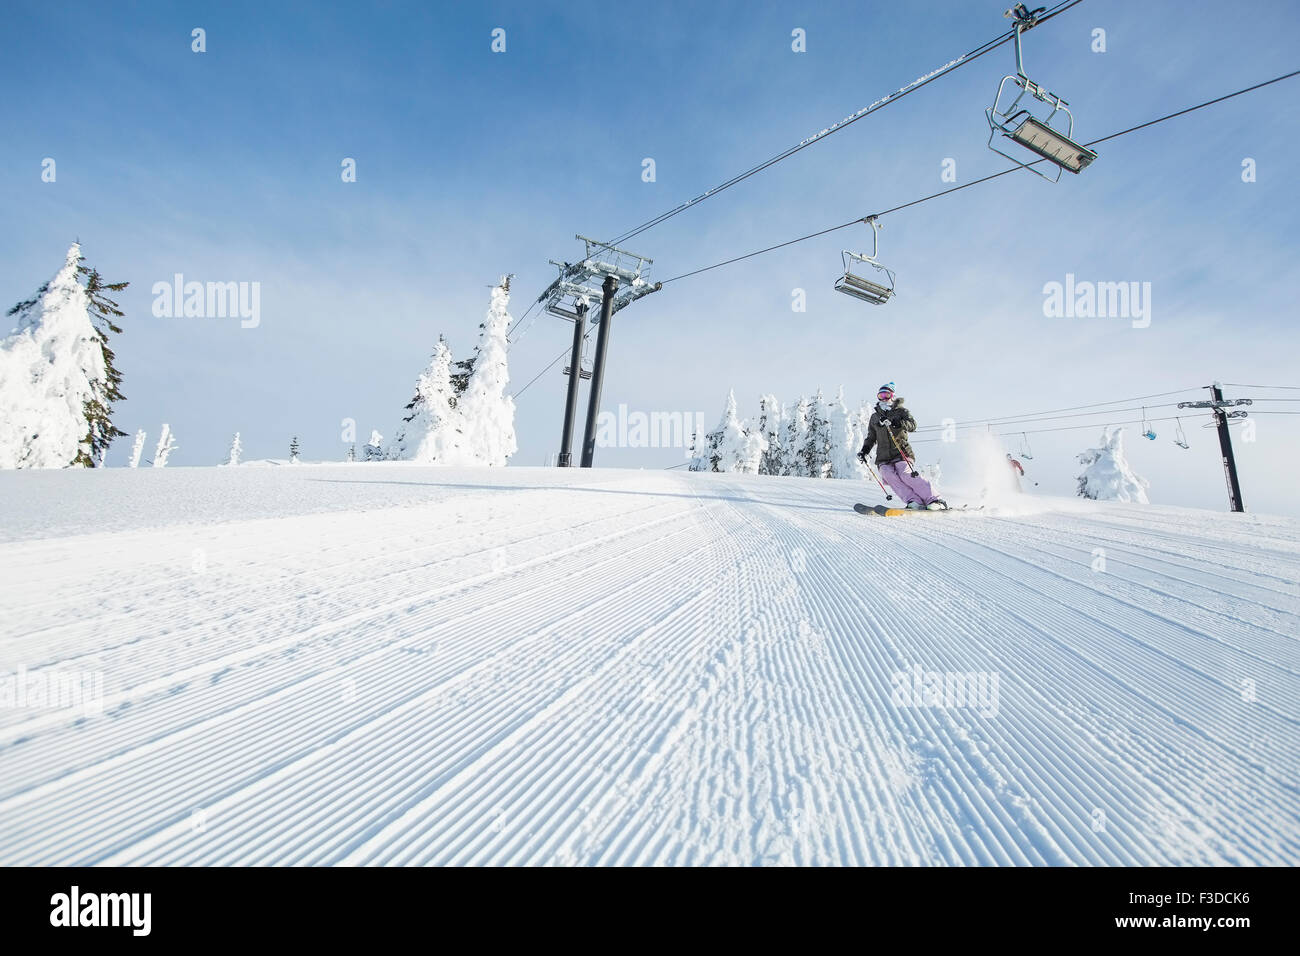 Mid-Adult Woman auf Skipiste unter Seilbahn Stockbild